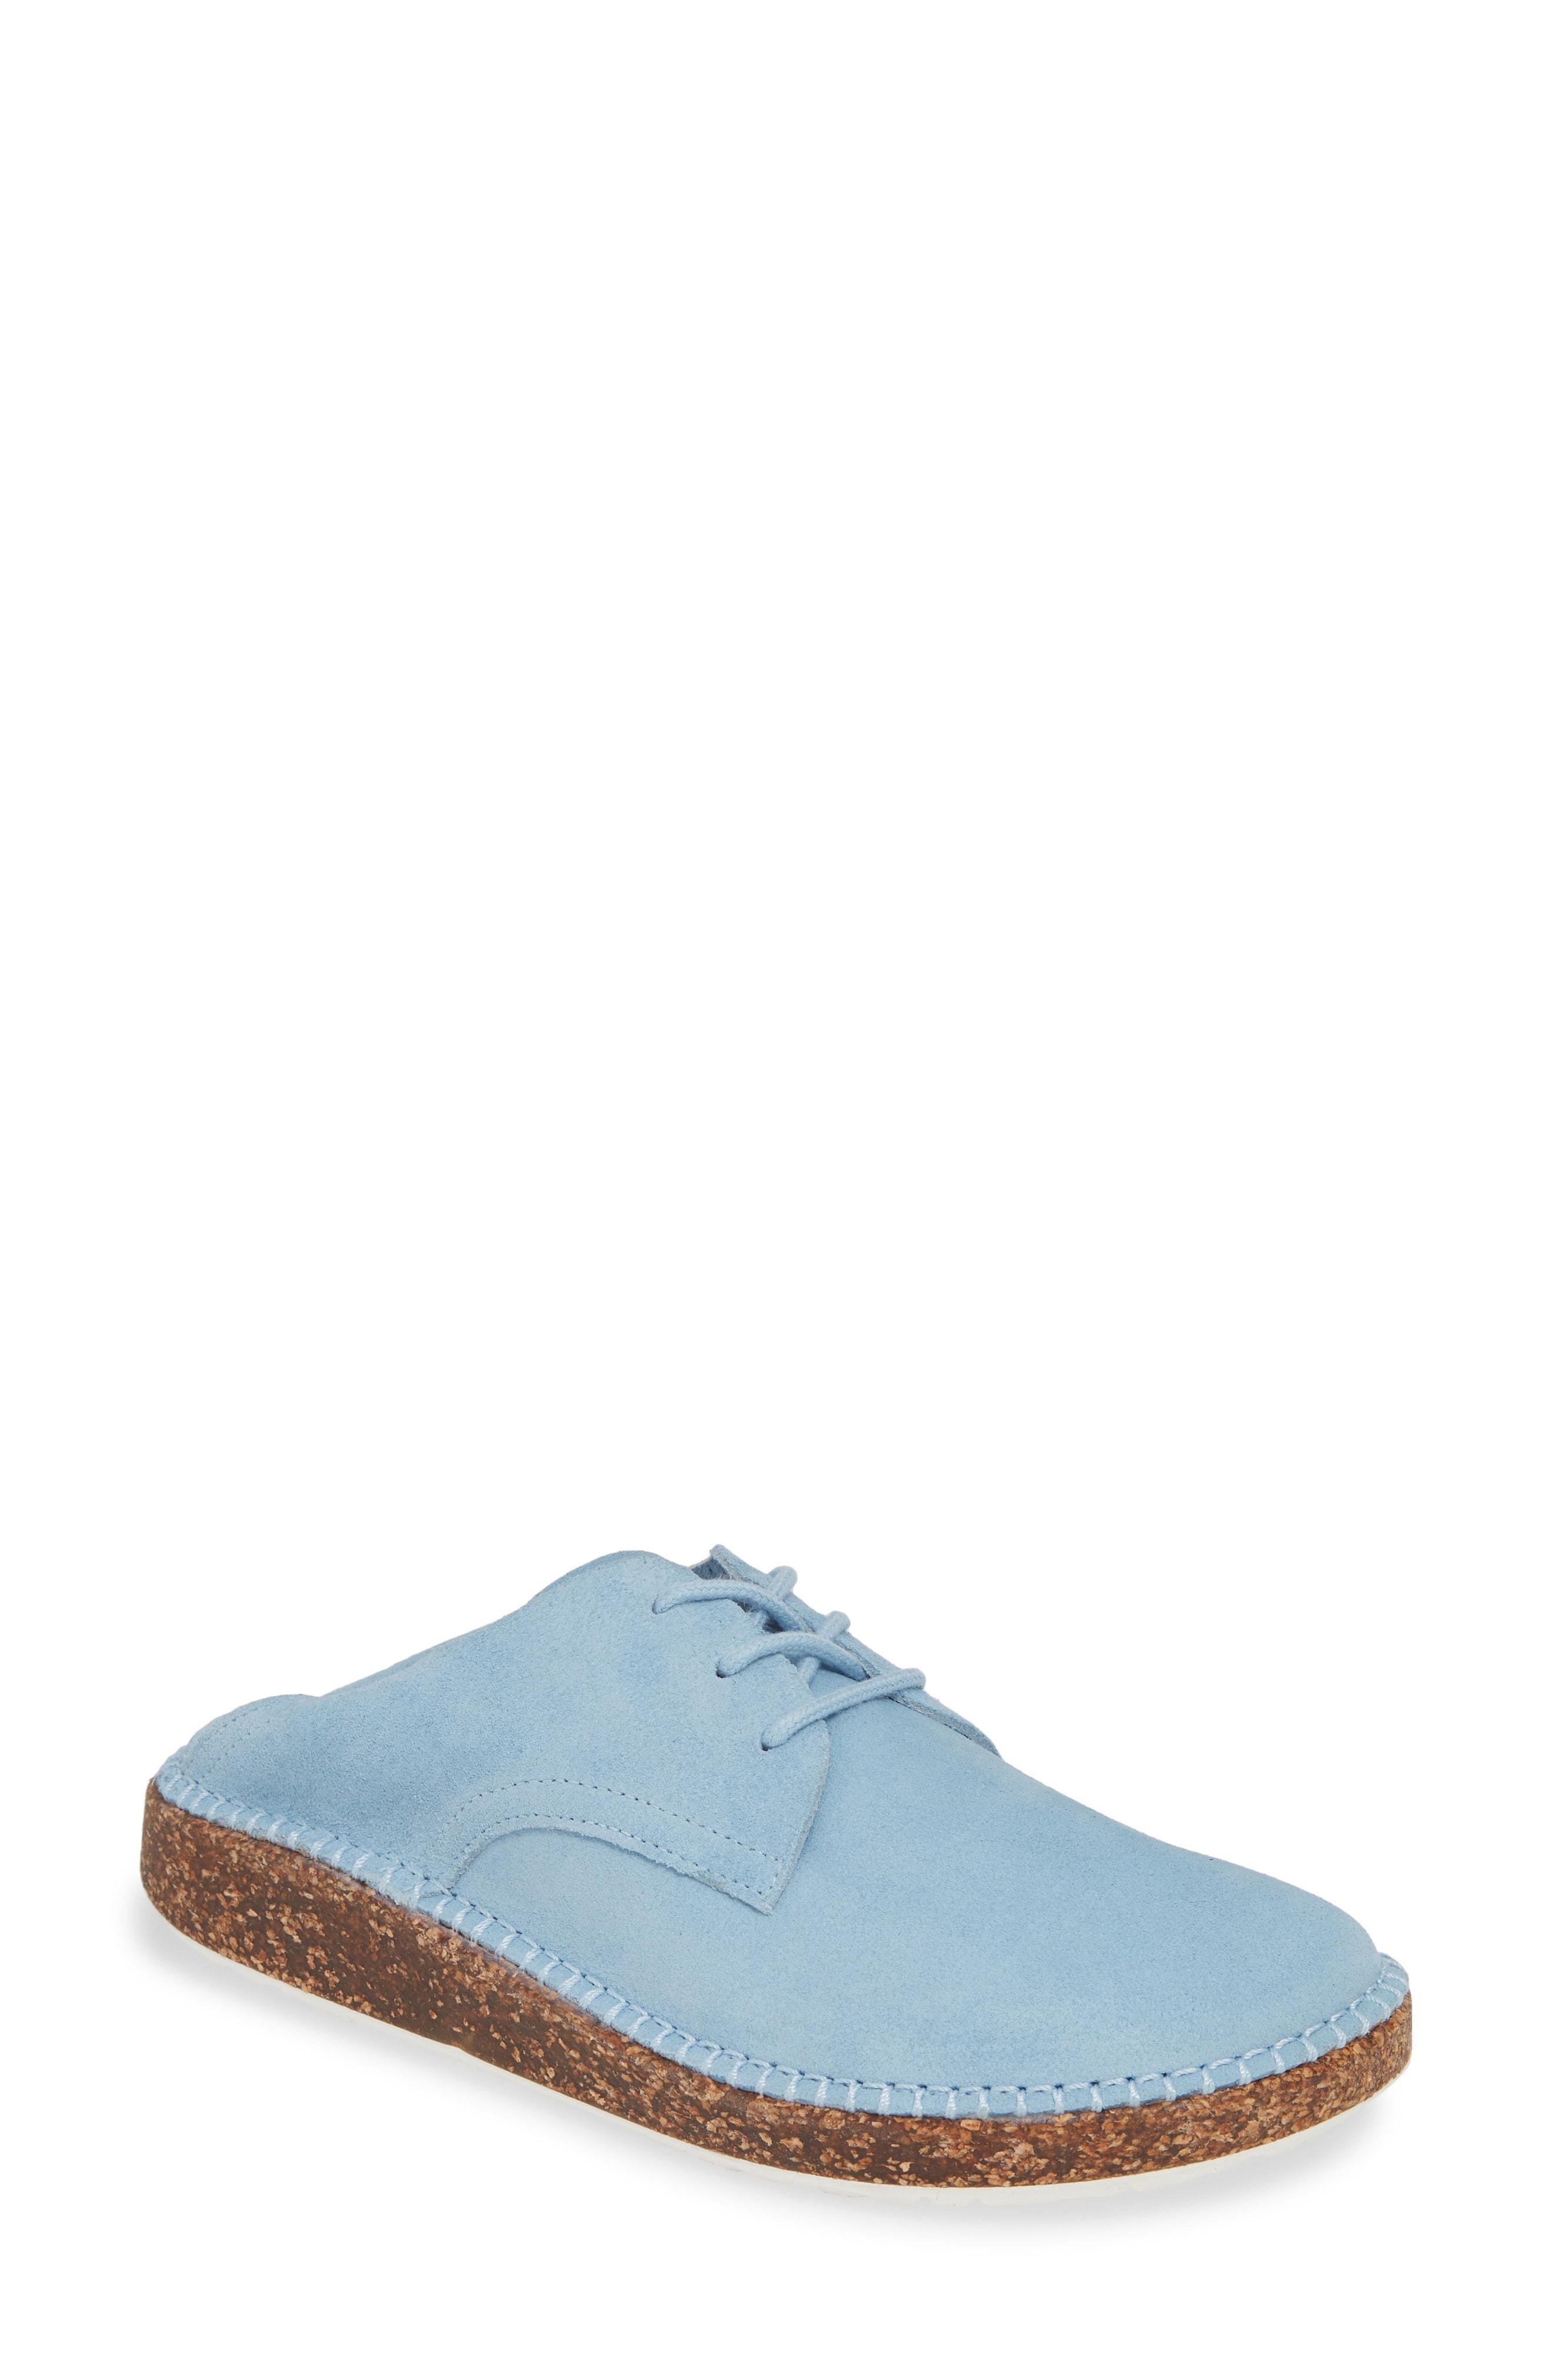 507a7188fa87 Lyst - Birkenstock Gary Convertible Derby in Blue